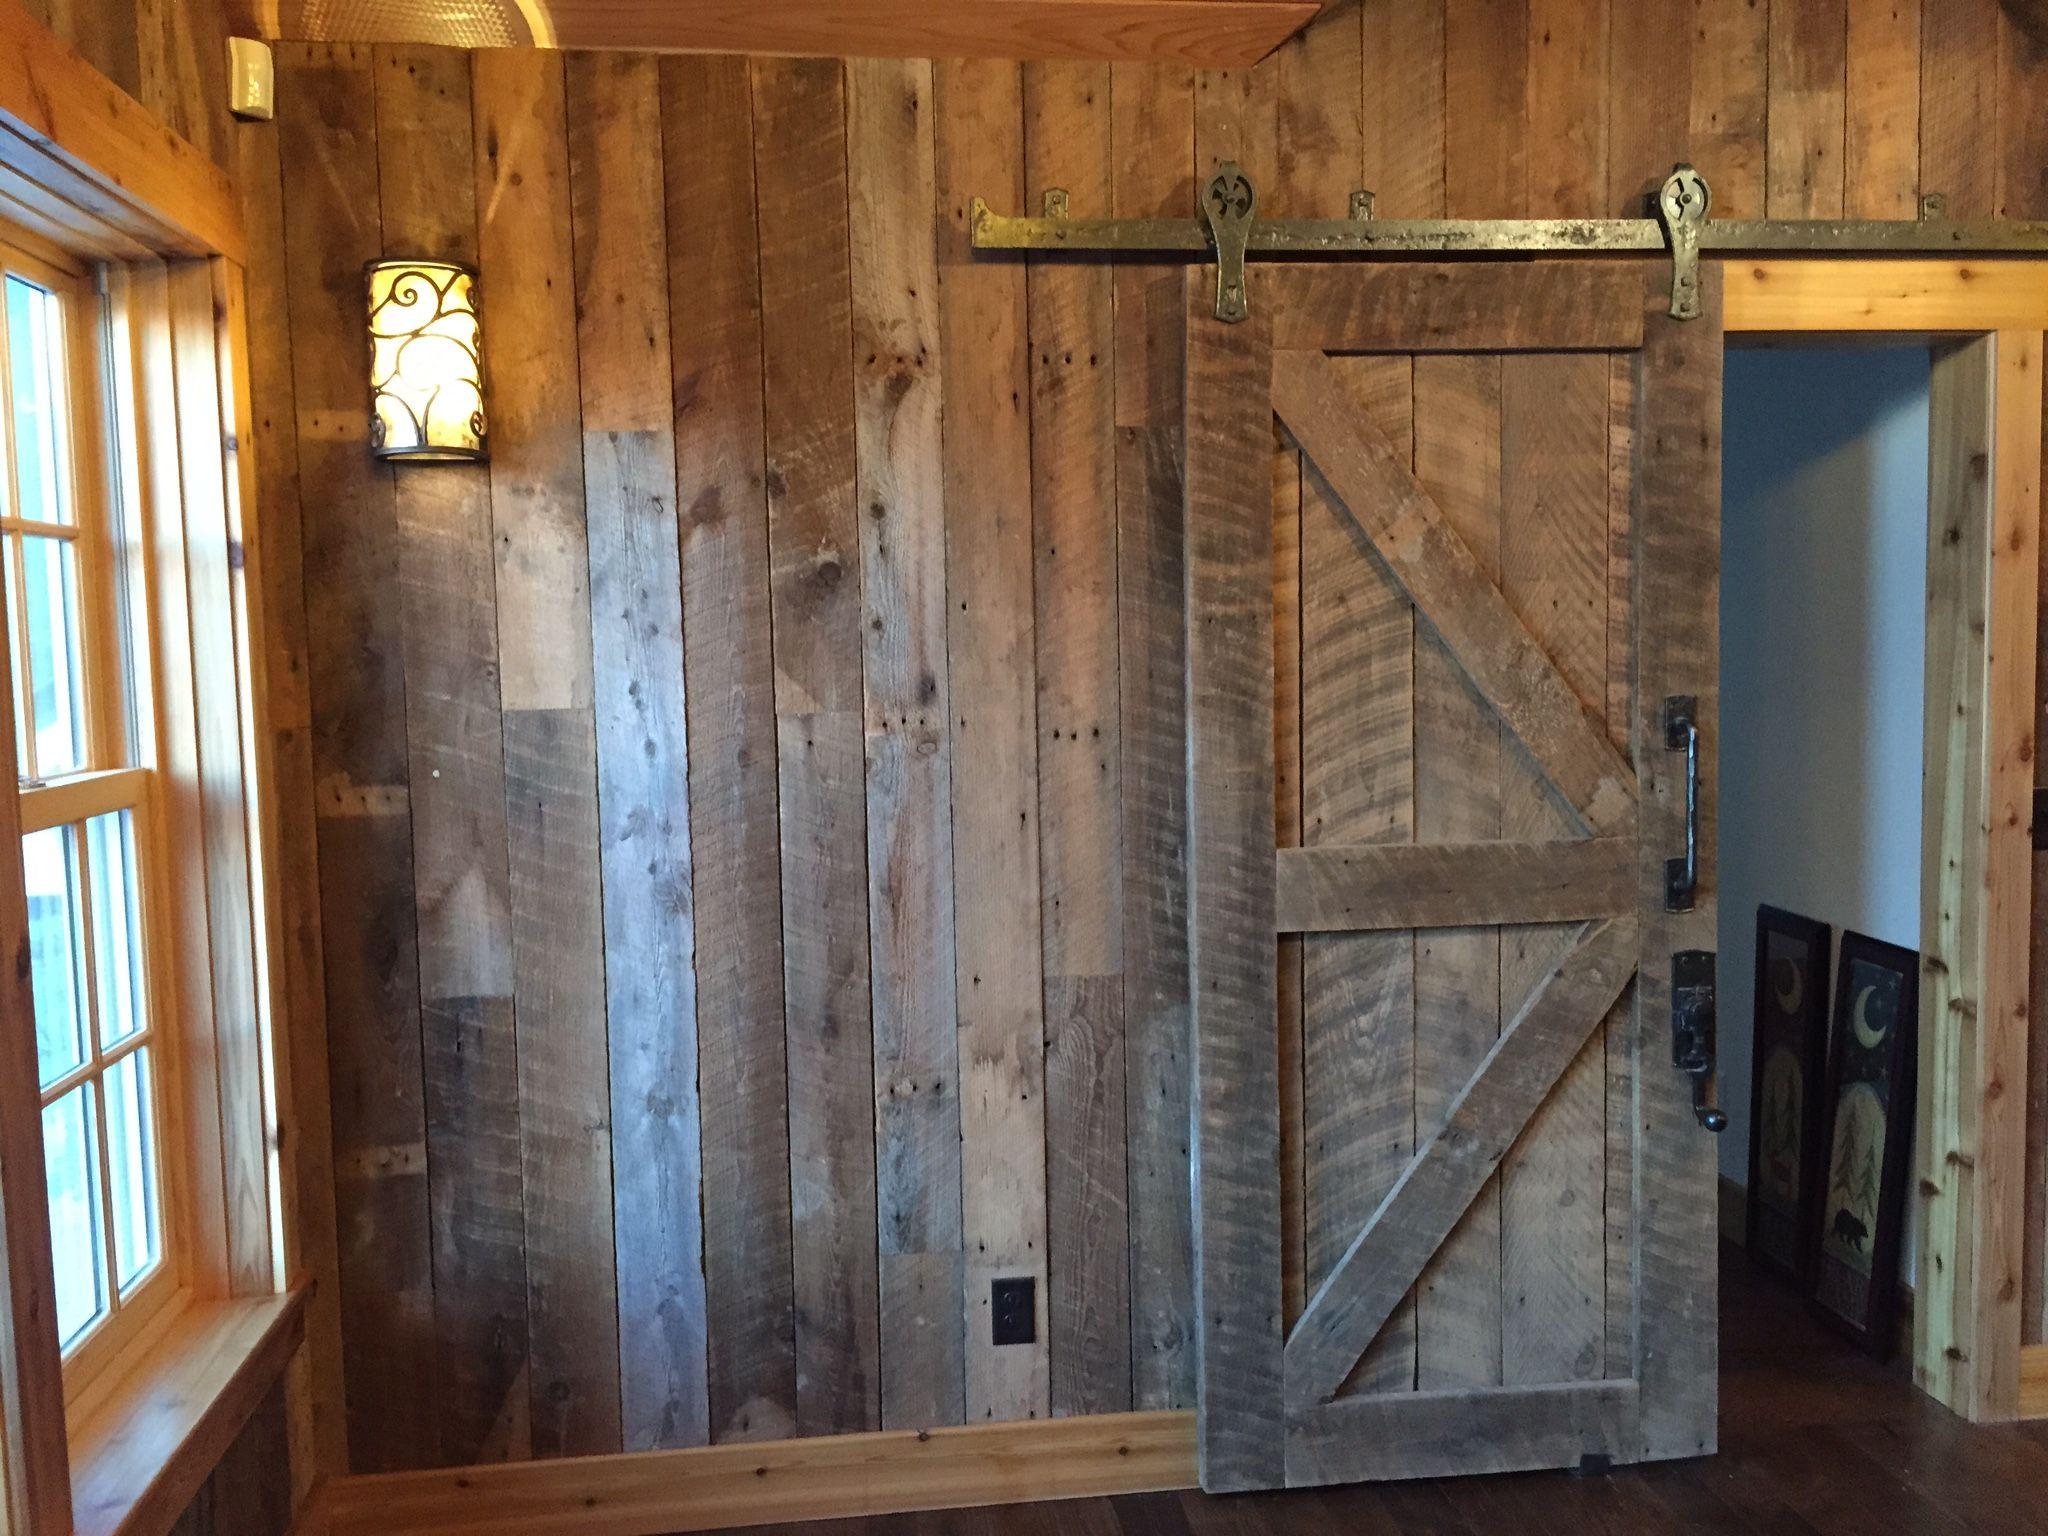 Wohnzimmerfliesen an der wand brown barn board canut wait to get my barn door for the basement